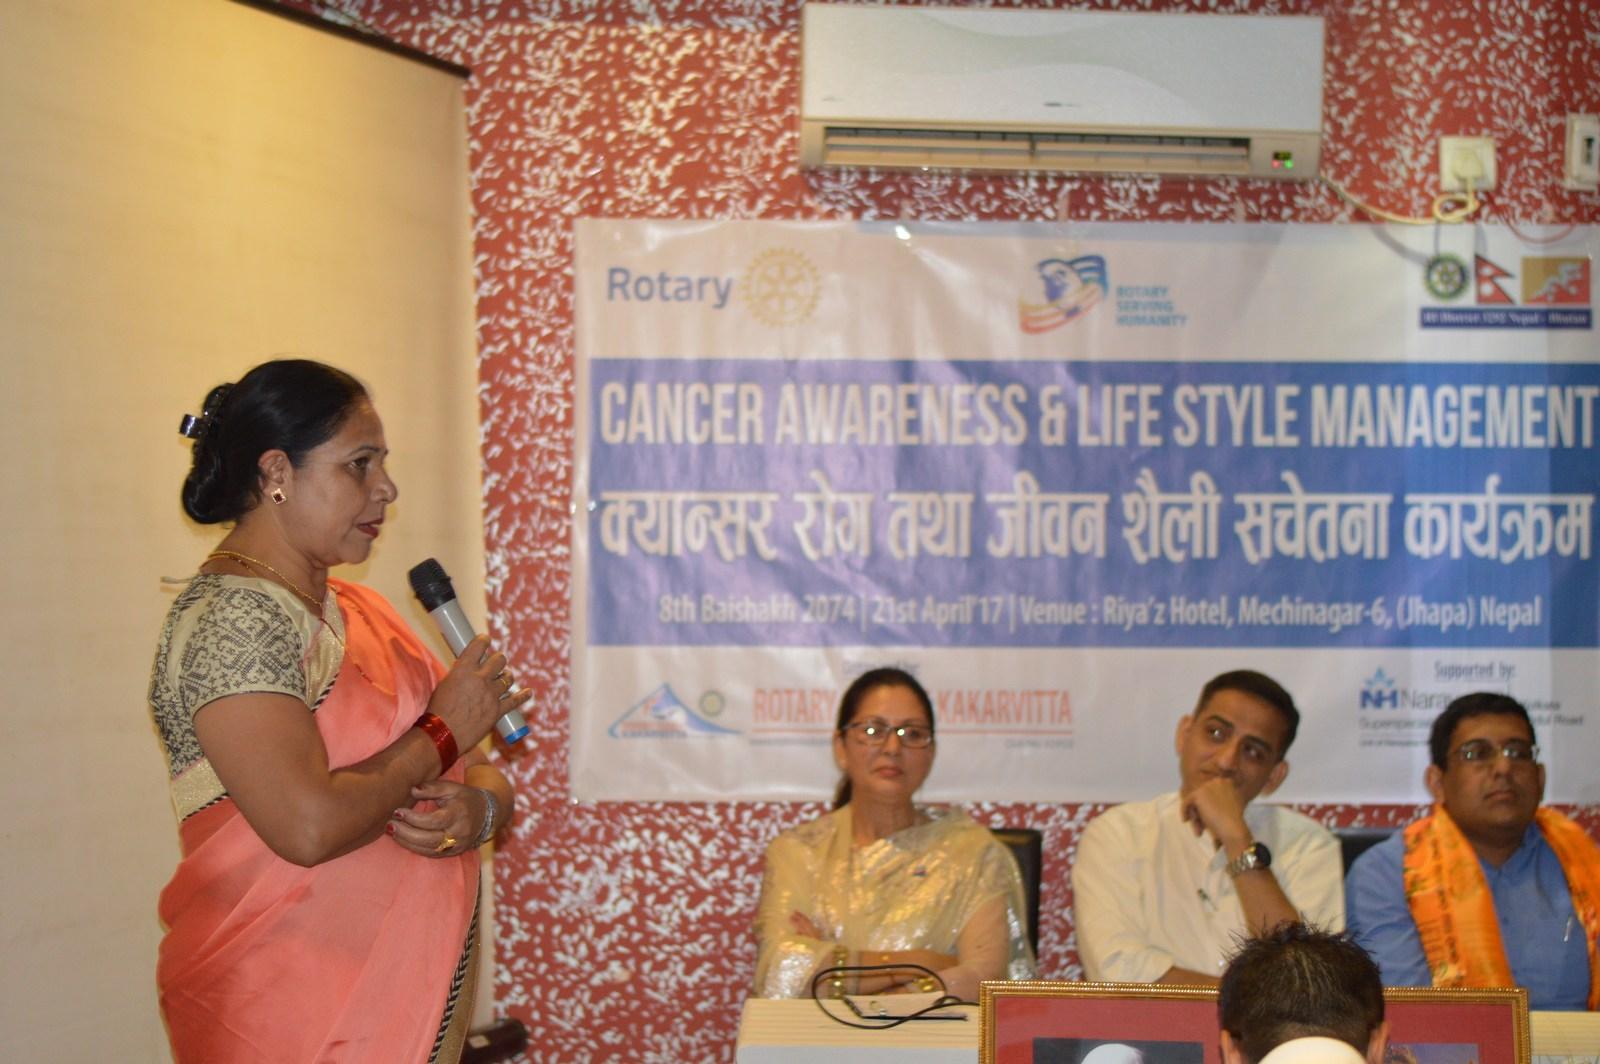 Cancer-Awareness-Life-Style-Management-Interaction-Program-2016-17-Rotary-Club-of-Kakarvitta-95